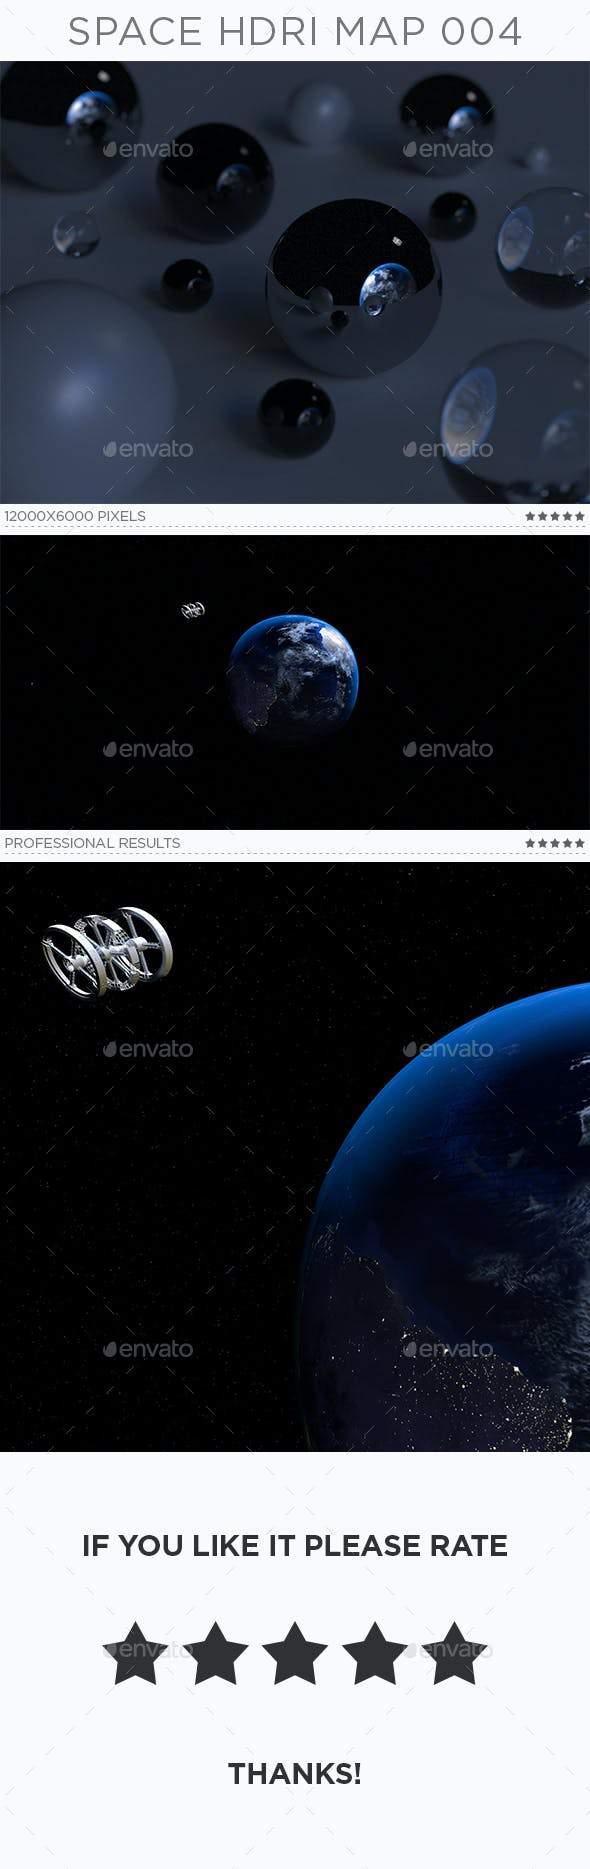 Space HDRi Map 004 - 3DOcean Item for Sale